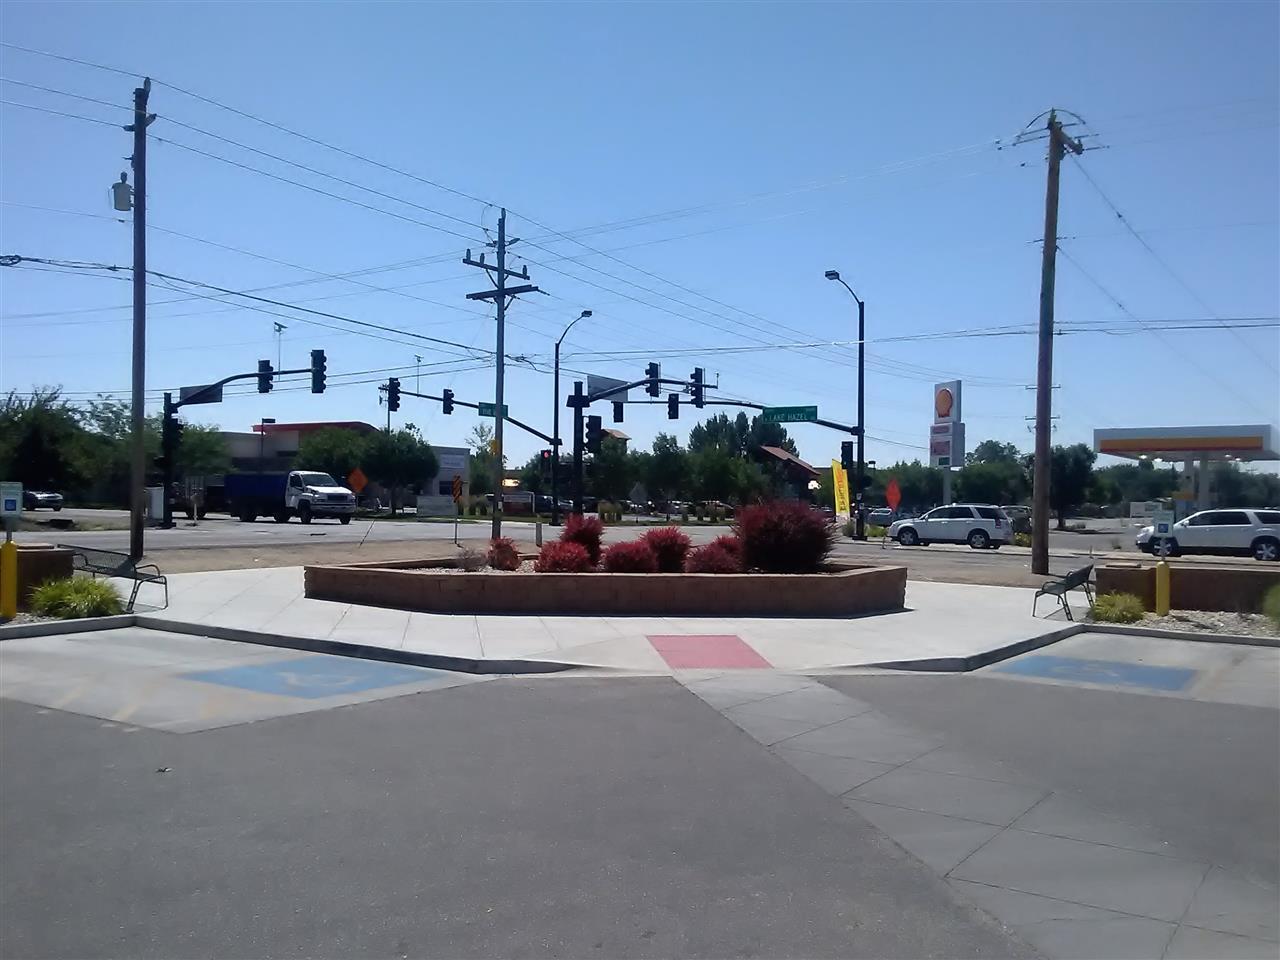 6190 S Five Mile, Boise, ID 83709